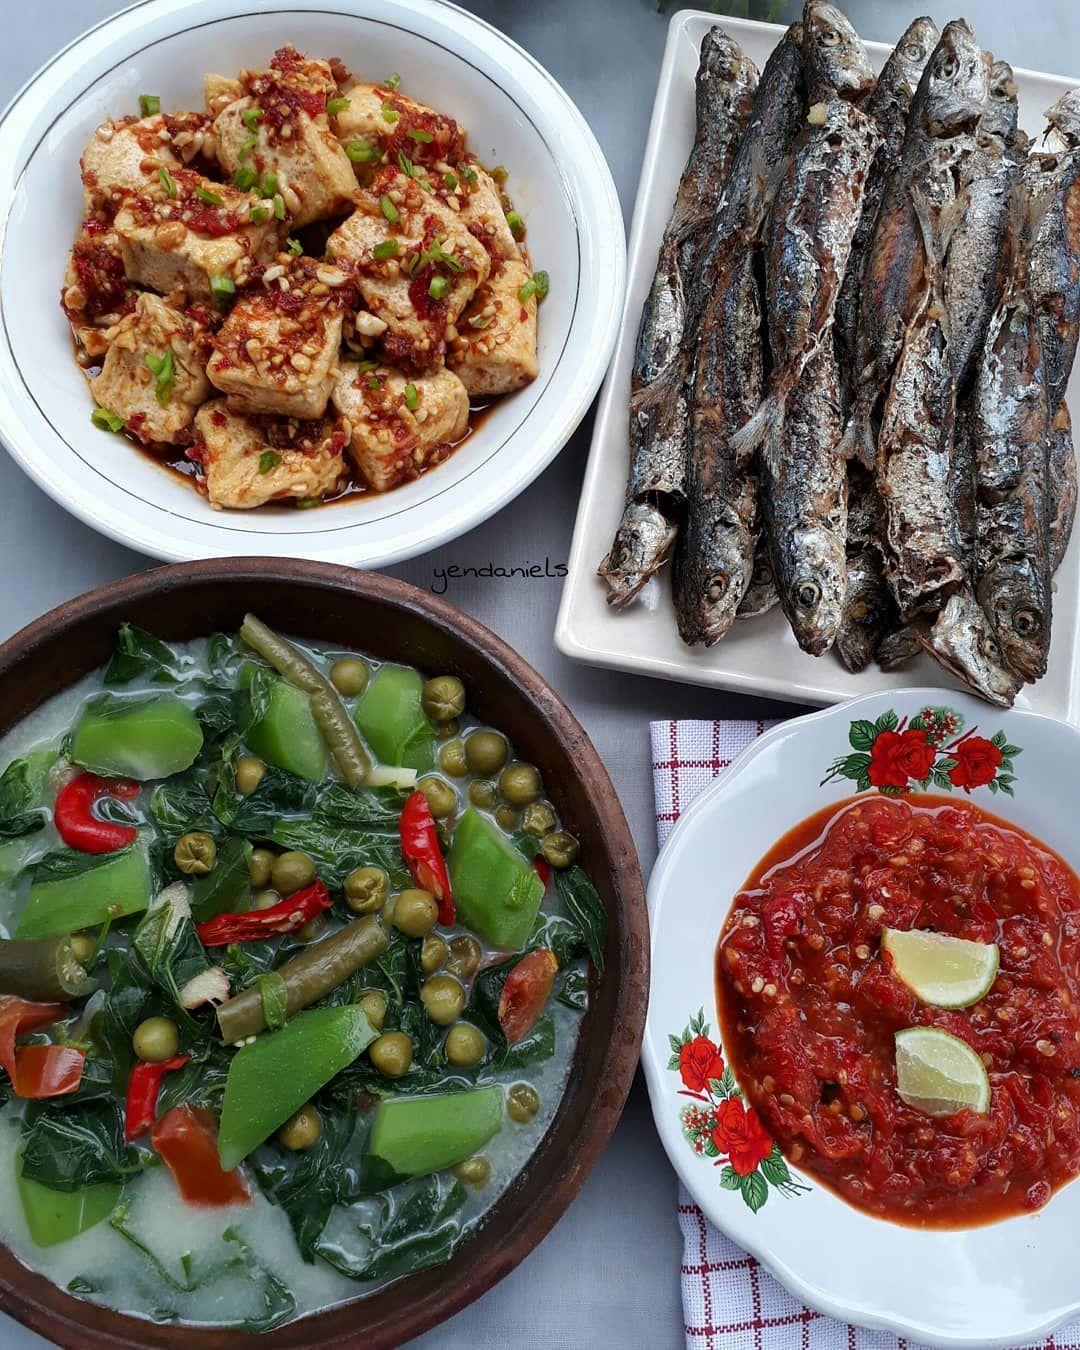 Kamis 11 10 2018 Sayur Basantan Ikan Layang Goreng Tahu Goreng Kecap Sambal Tomat Sayur Basantan Didihkan Santan Serai Resep Masakan Masakan Terong